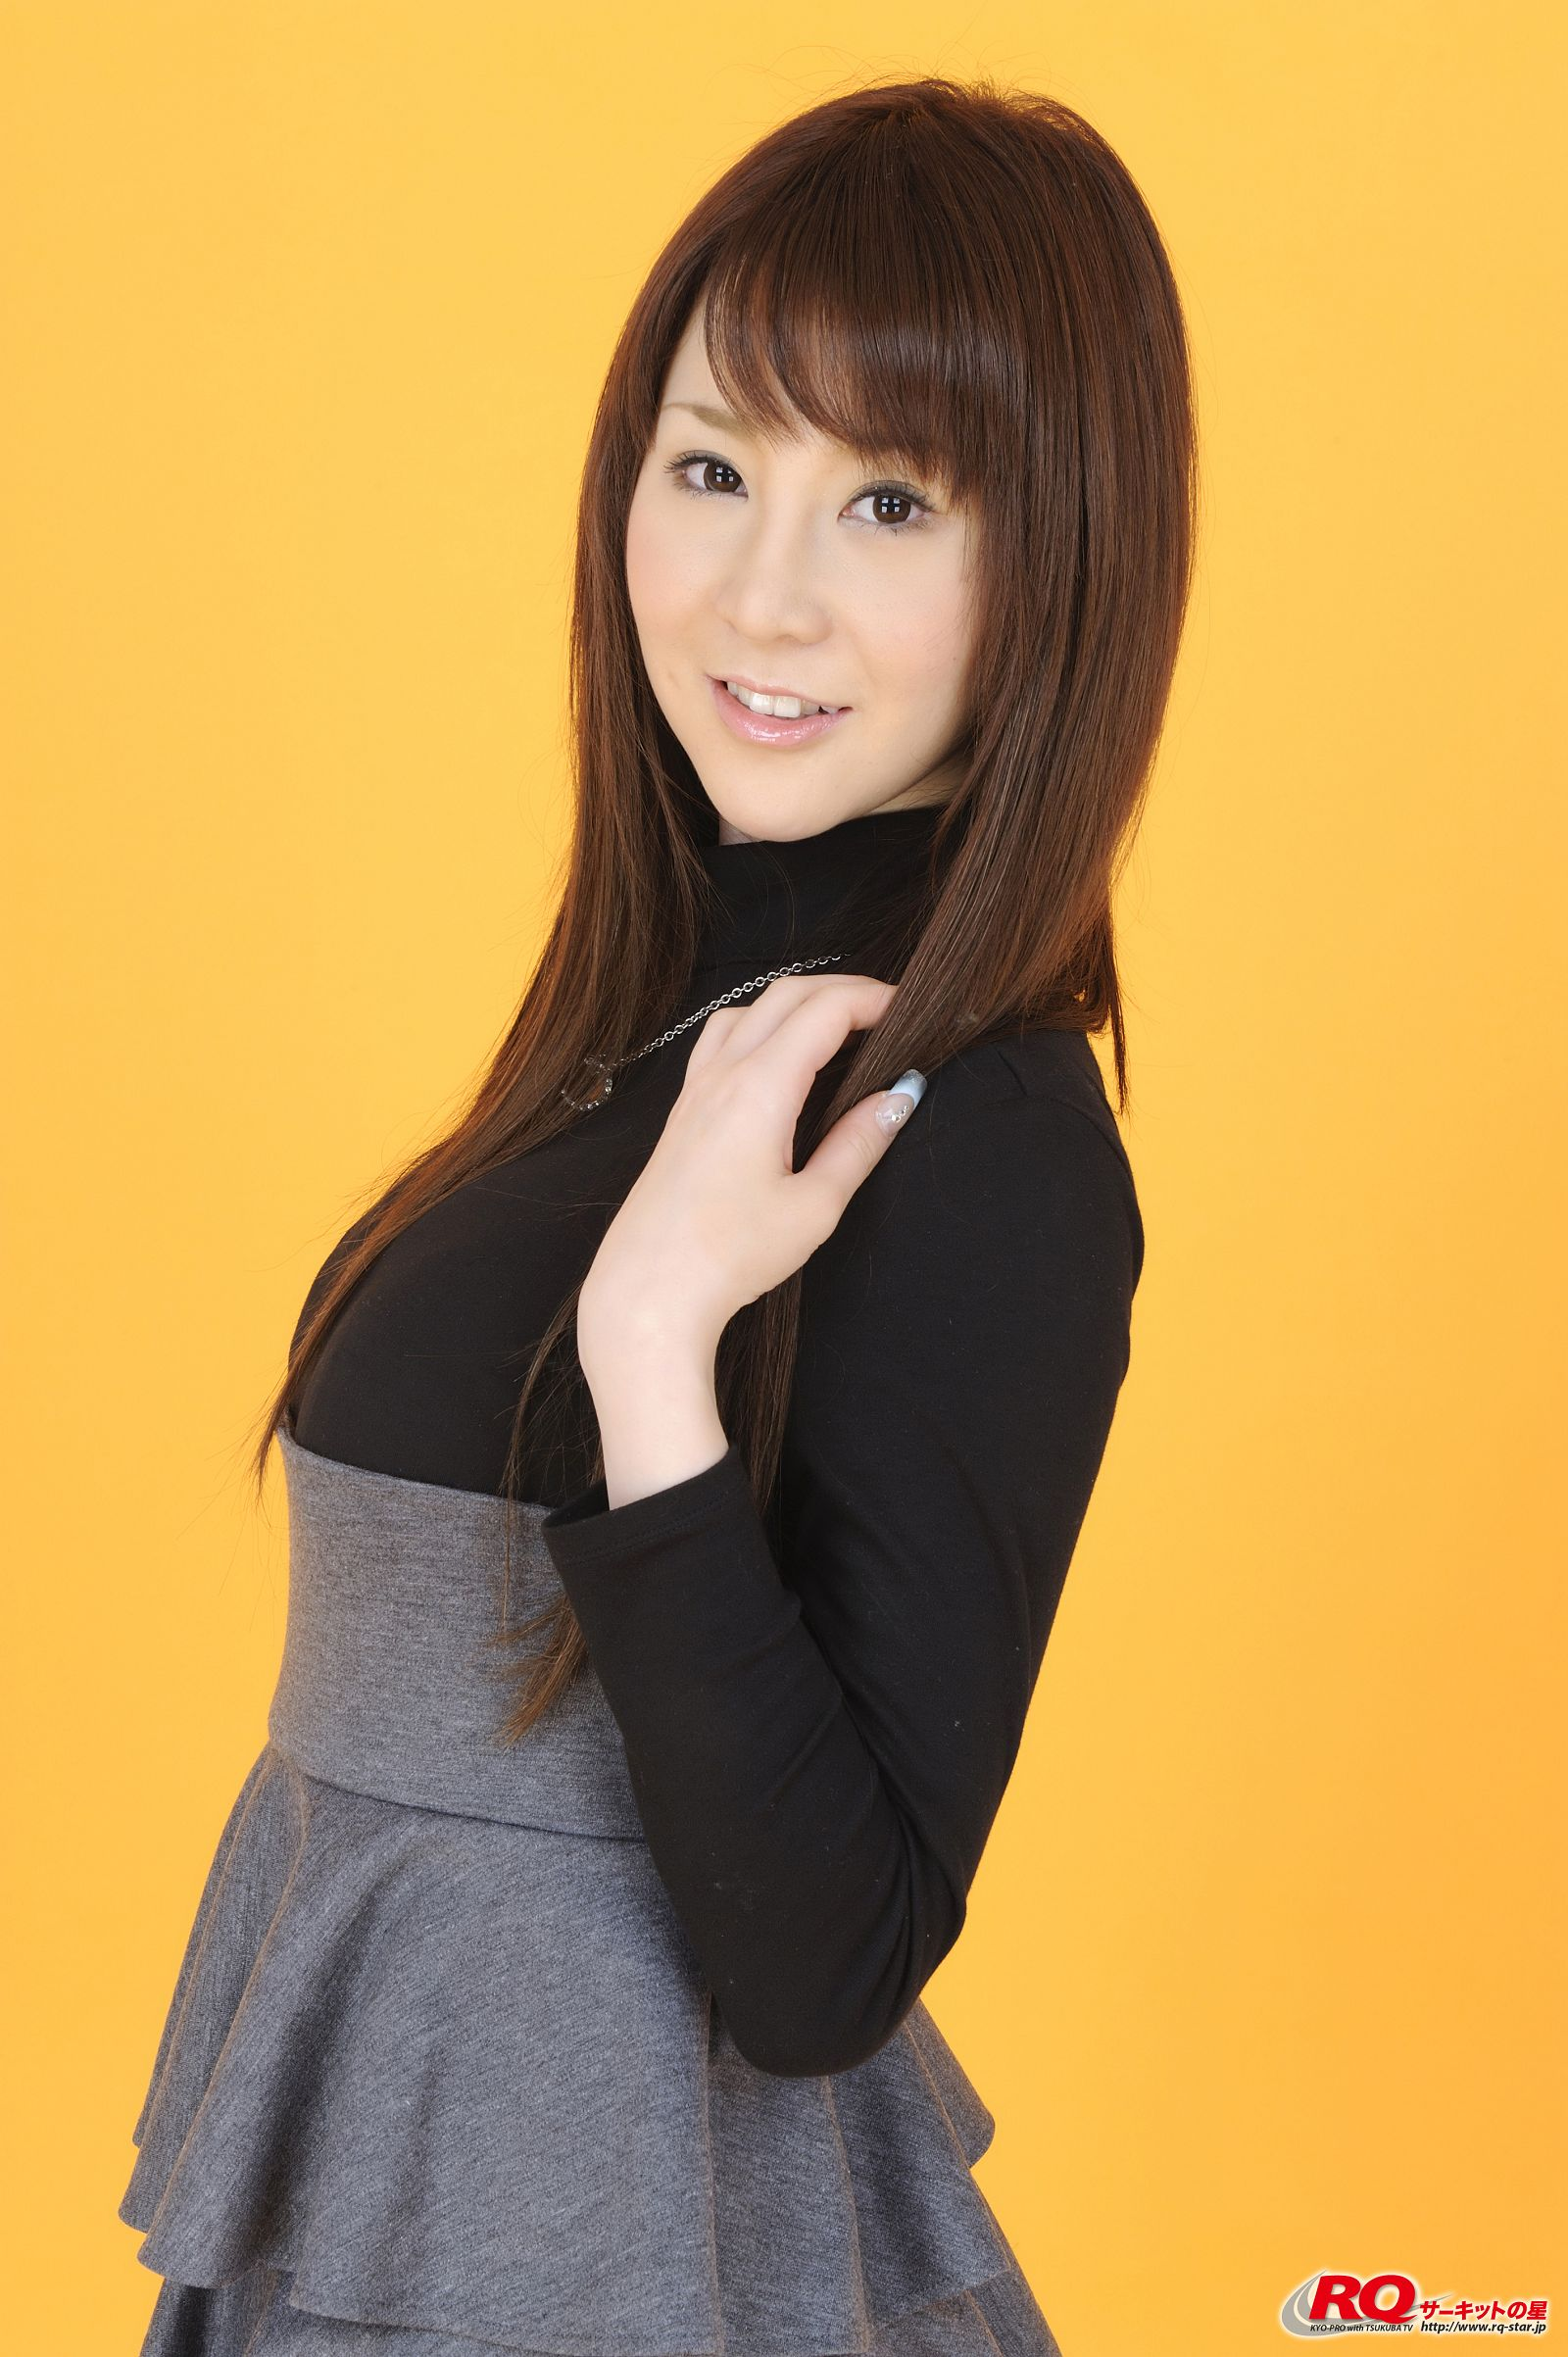 [RQ STAR美女] NO.00122 Yuko Nakamura 中村优子 Private Dress[81P] RQ STAR 第4张